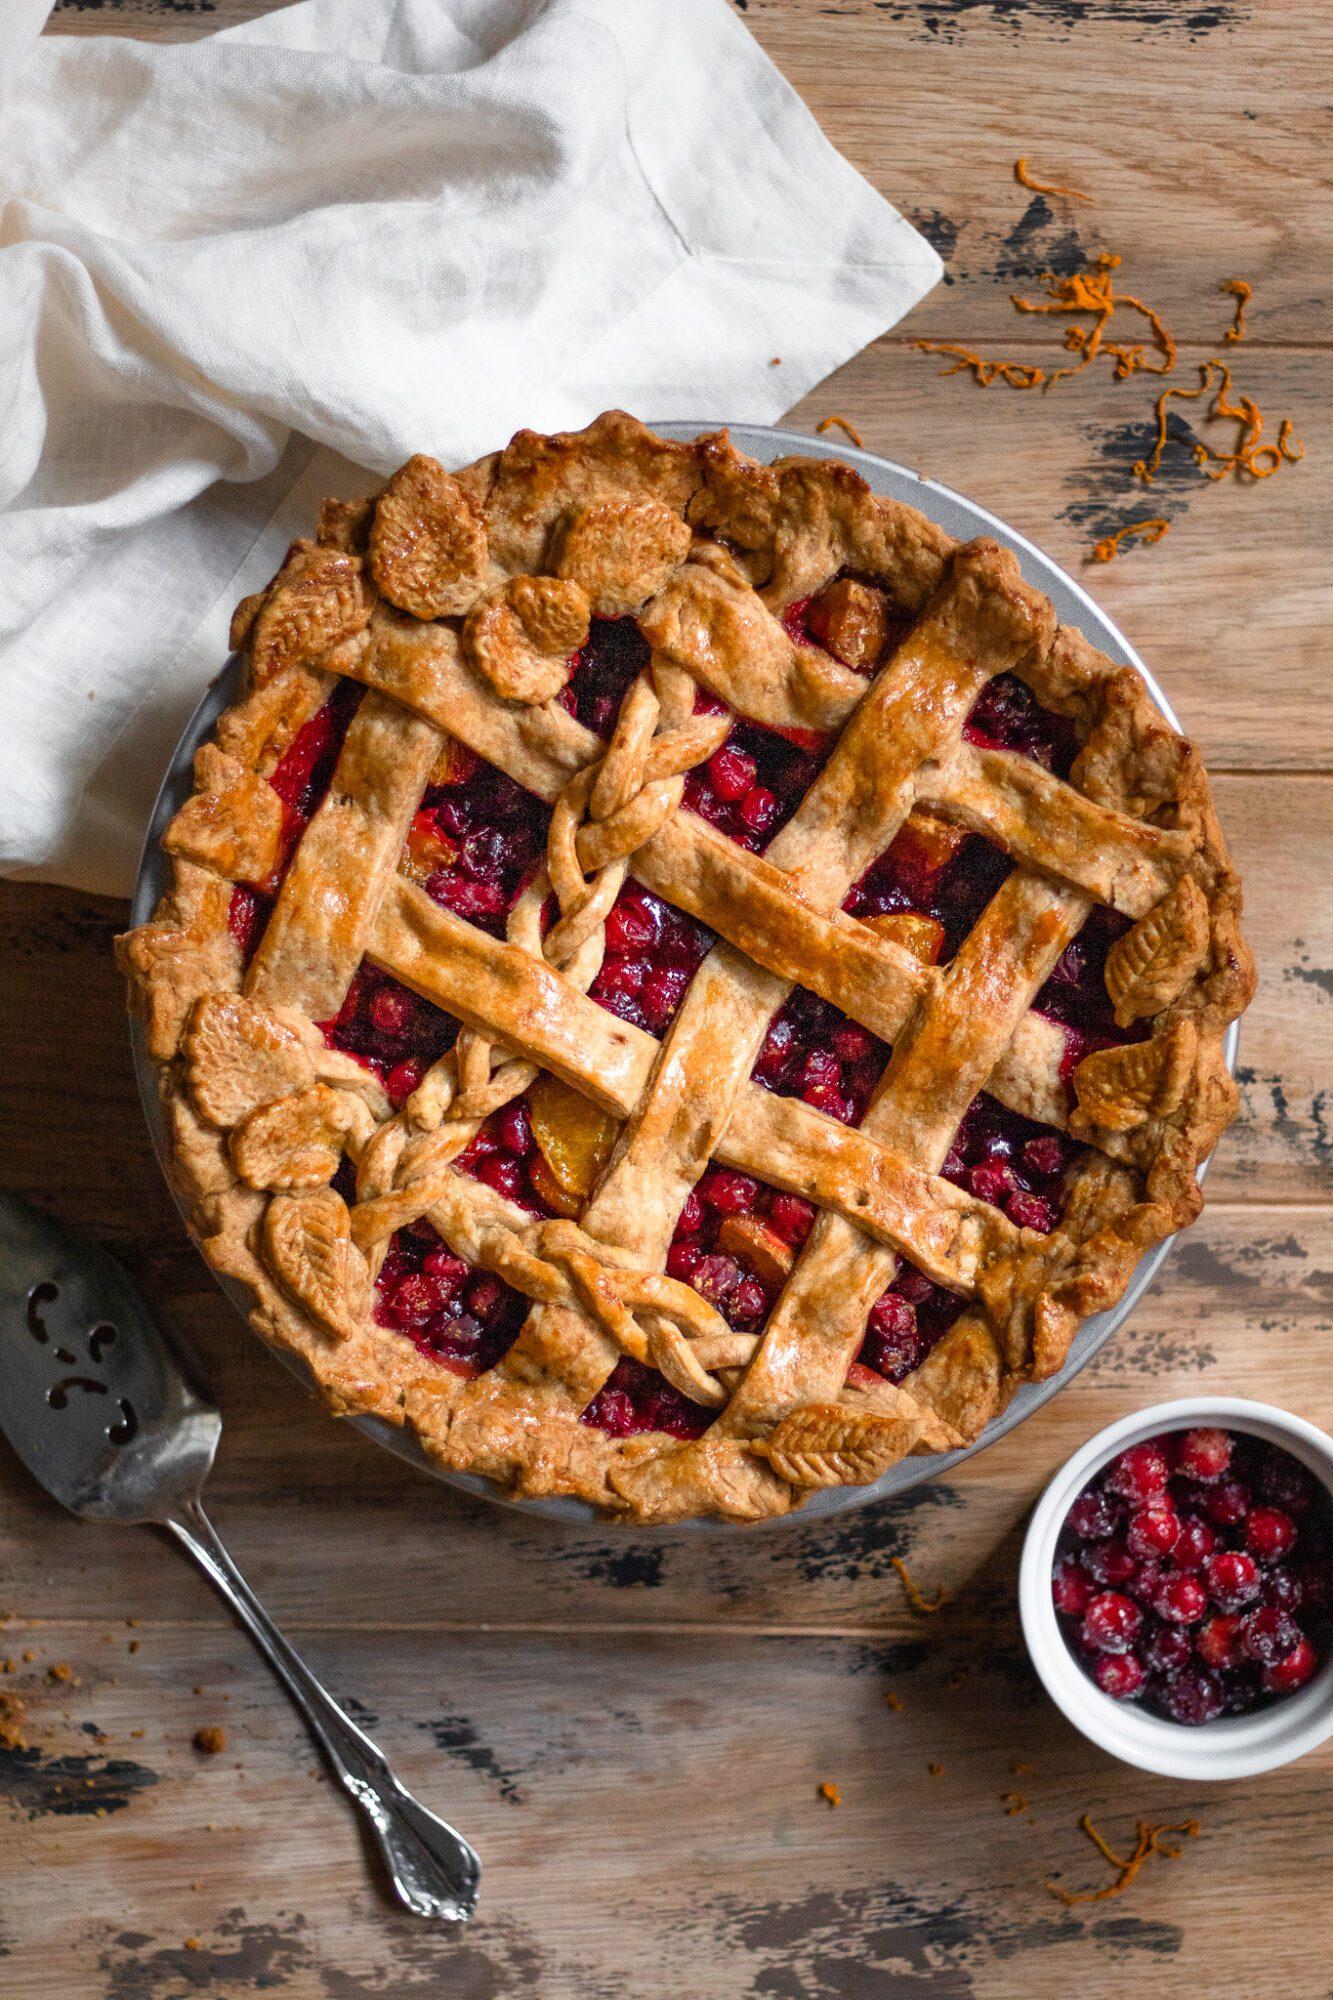 baked cranberry citrus pie with lattice crust